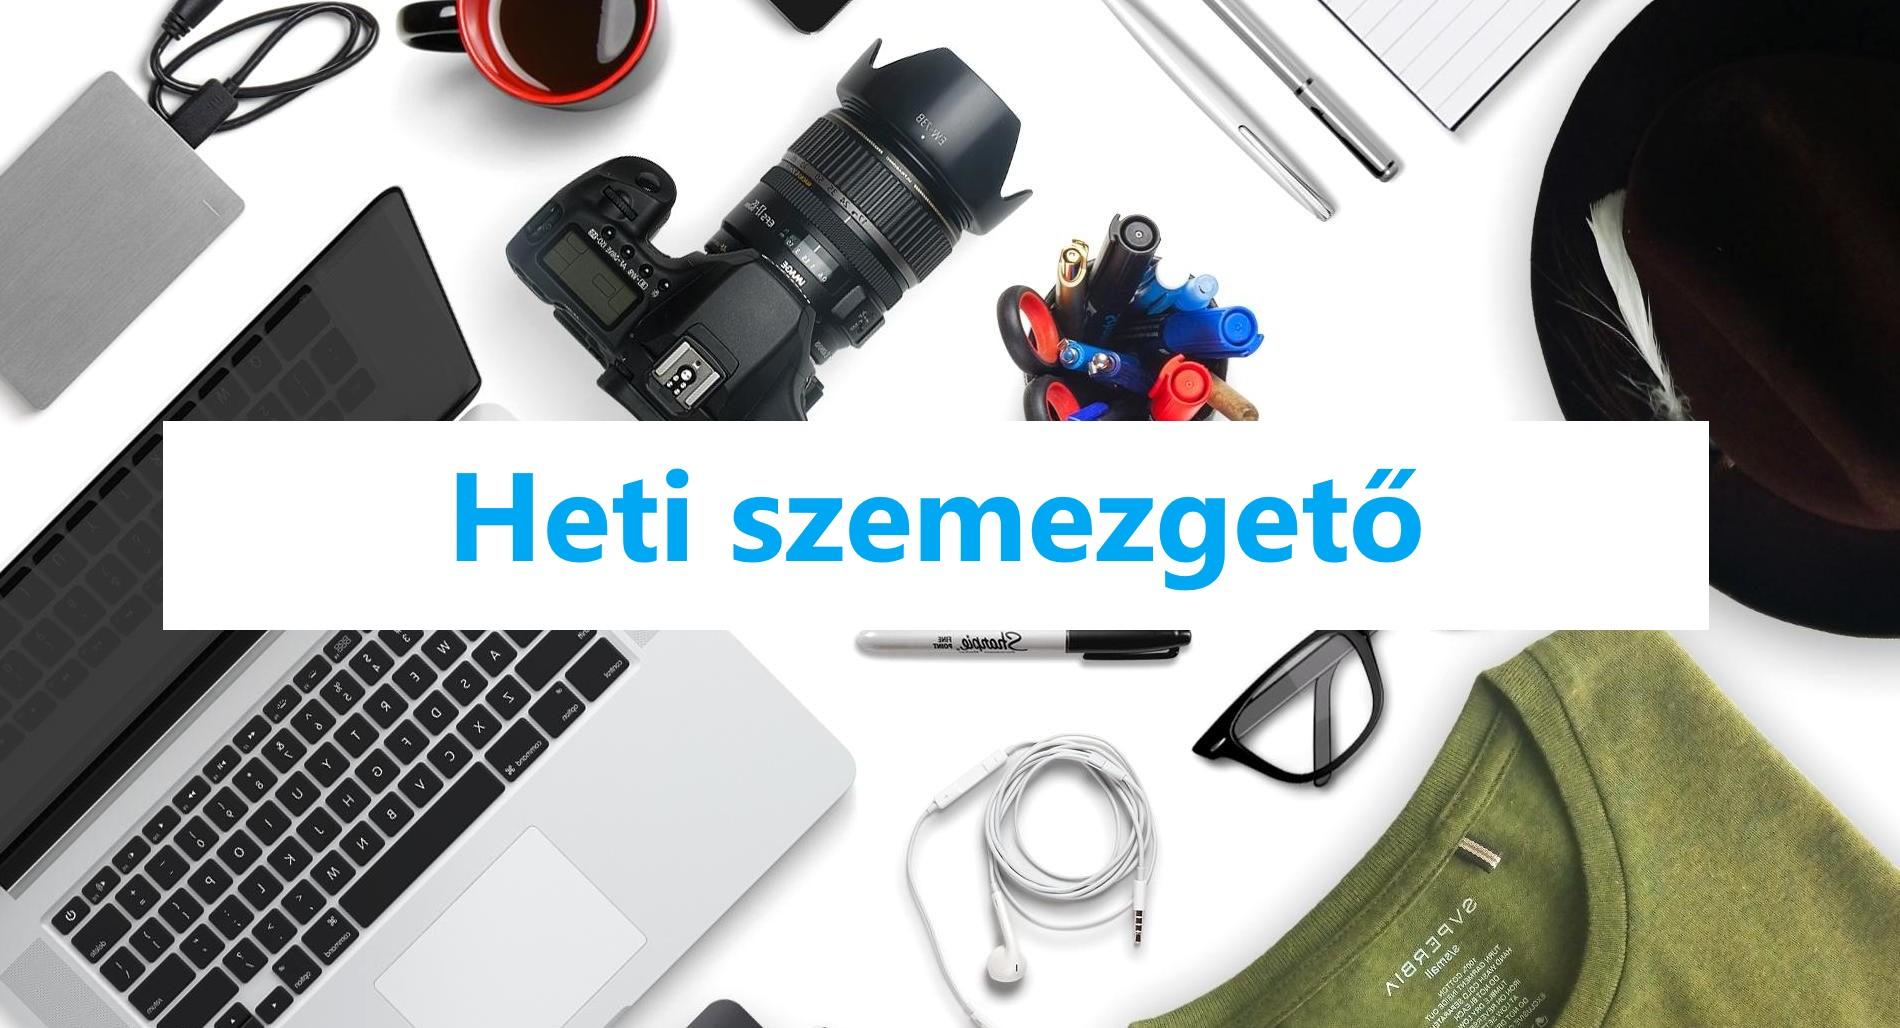 heti_szemezgeto_uj_30.jpg